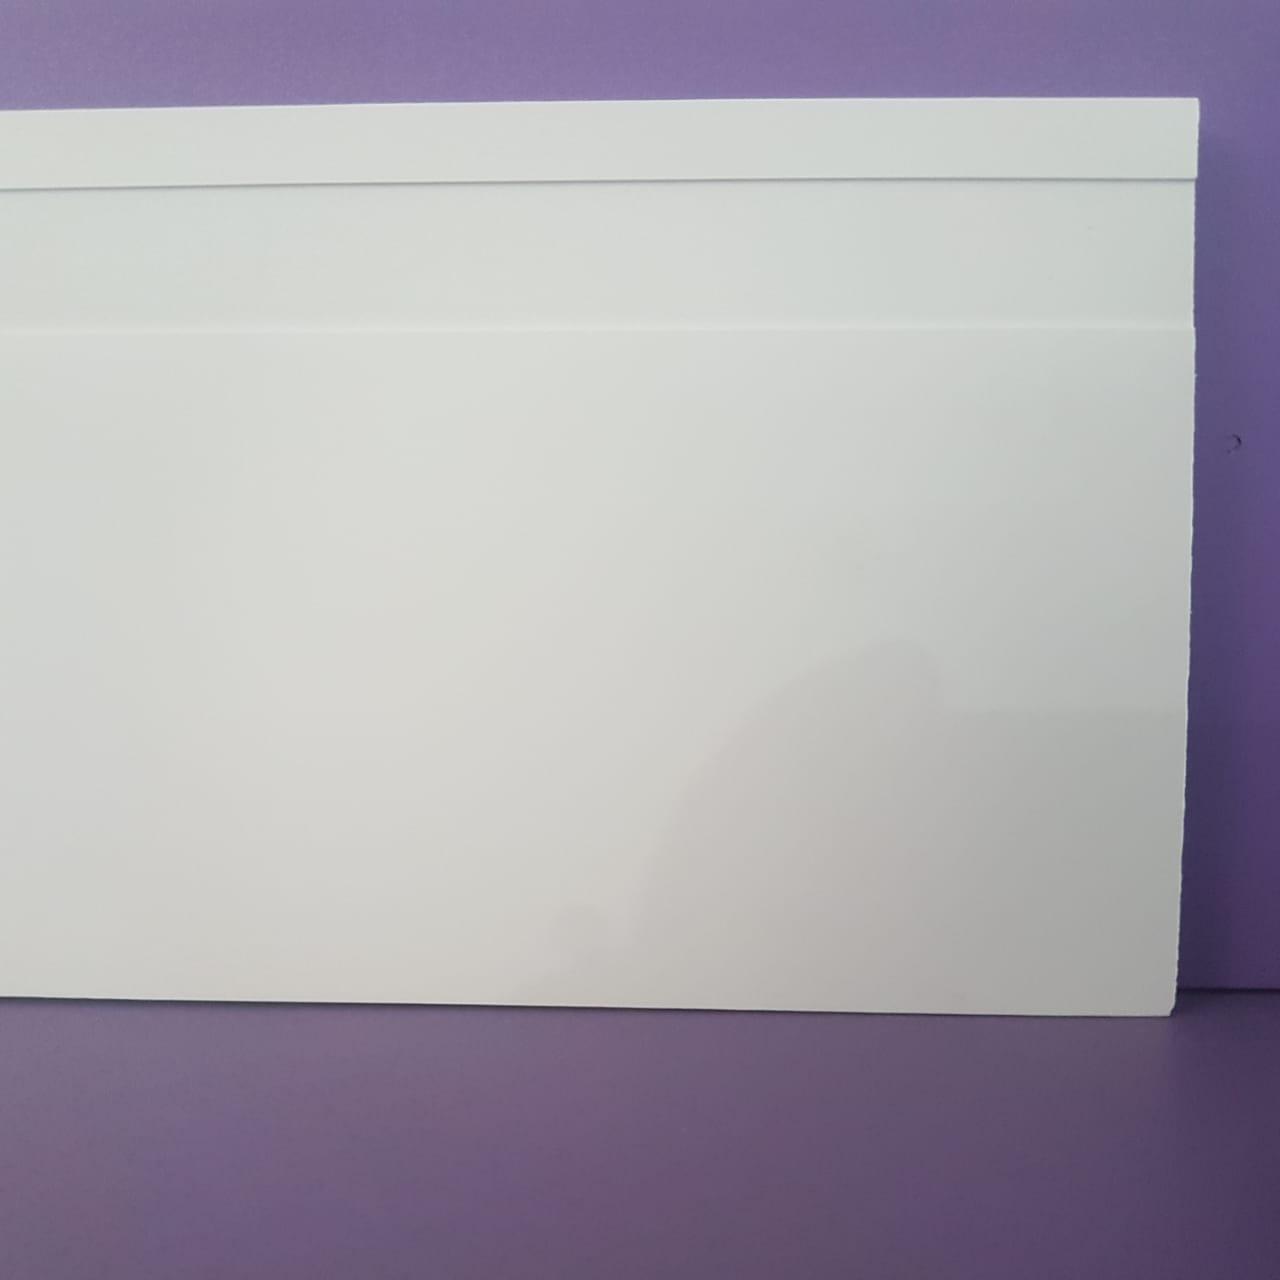 Rodapé de Poliestireno Frisado - Branco - 12cm de altura  (12x1x240cm)